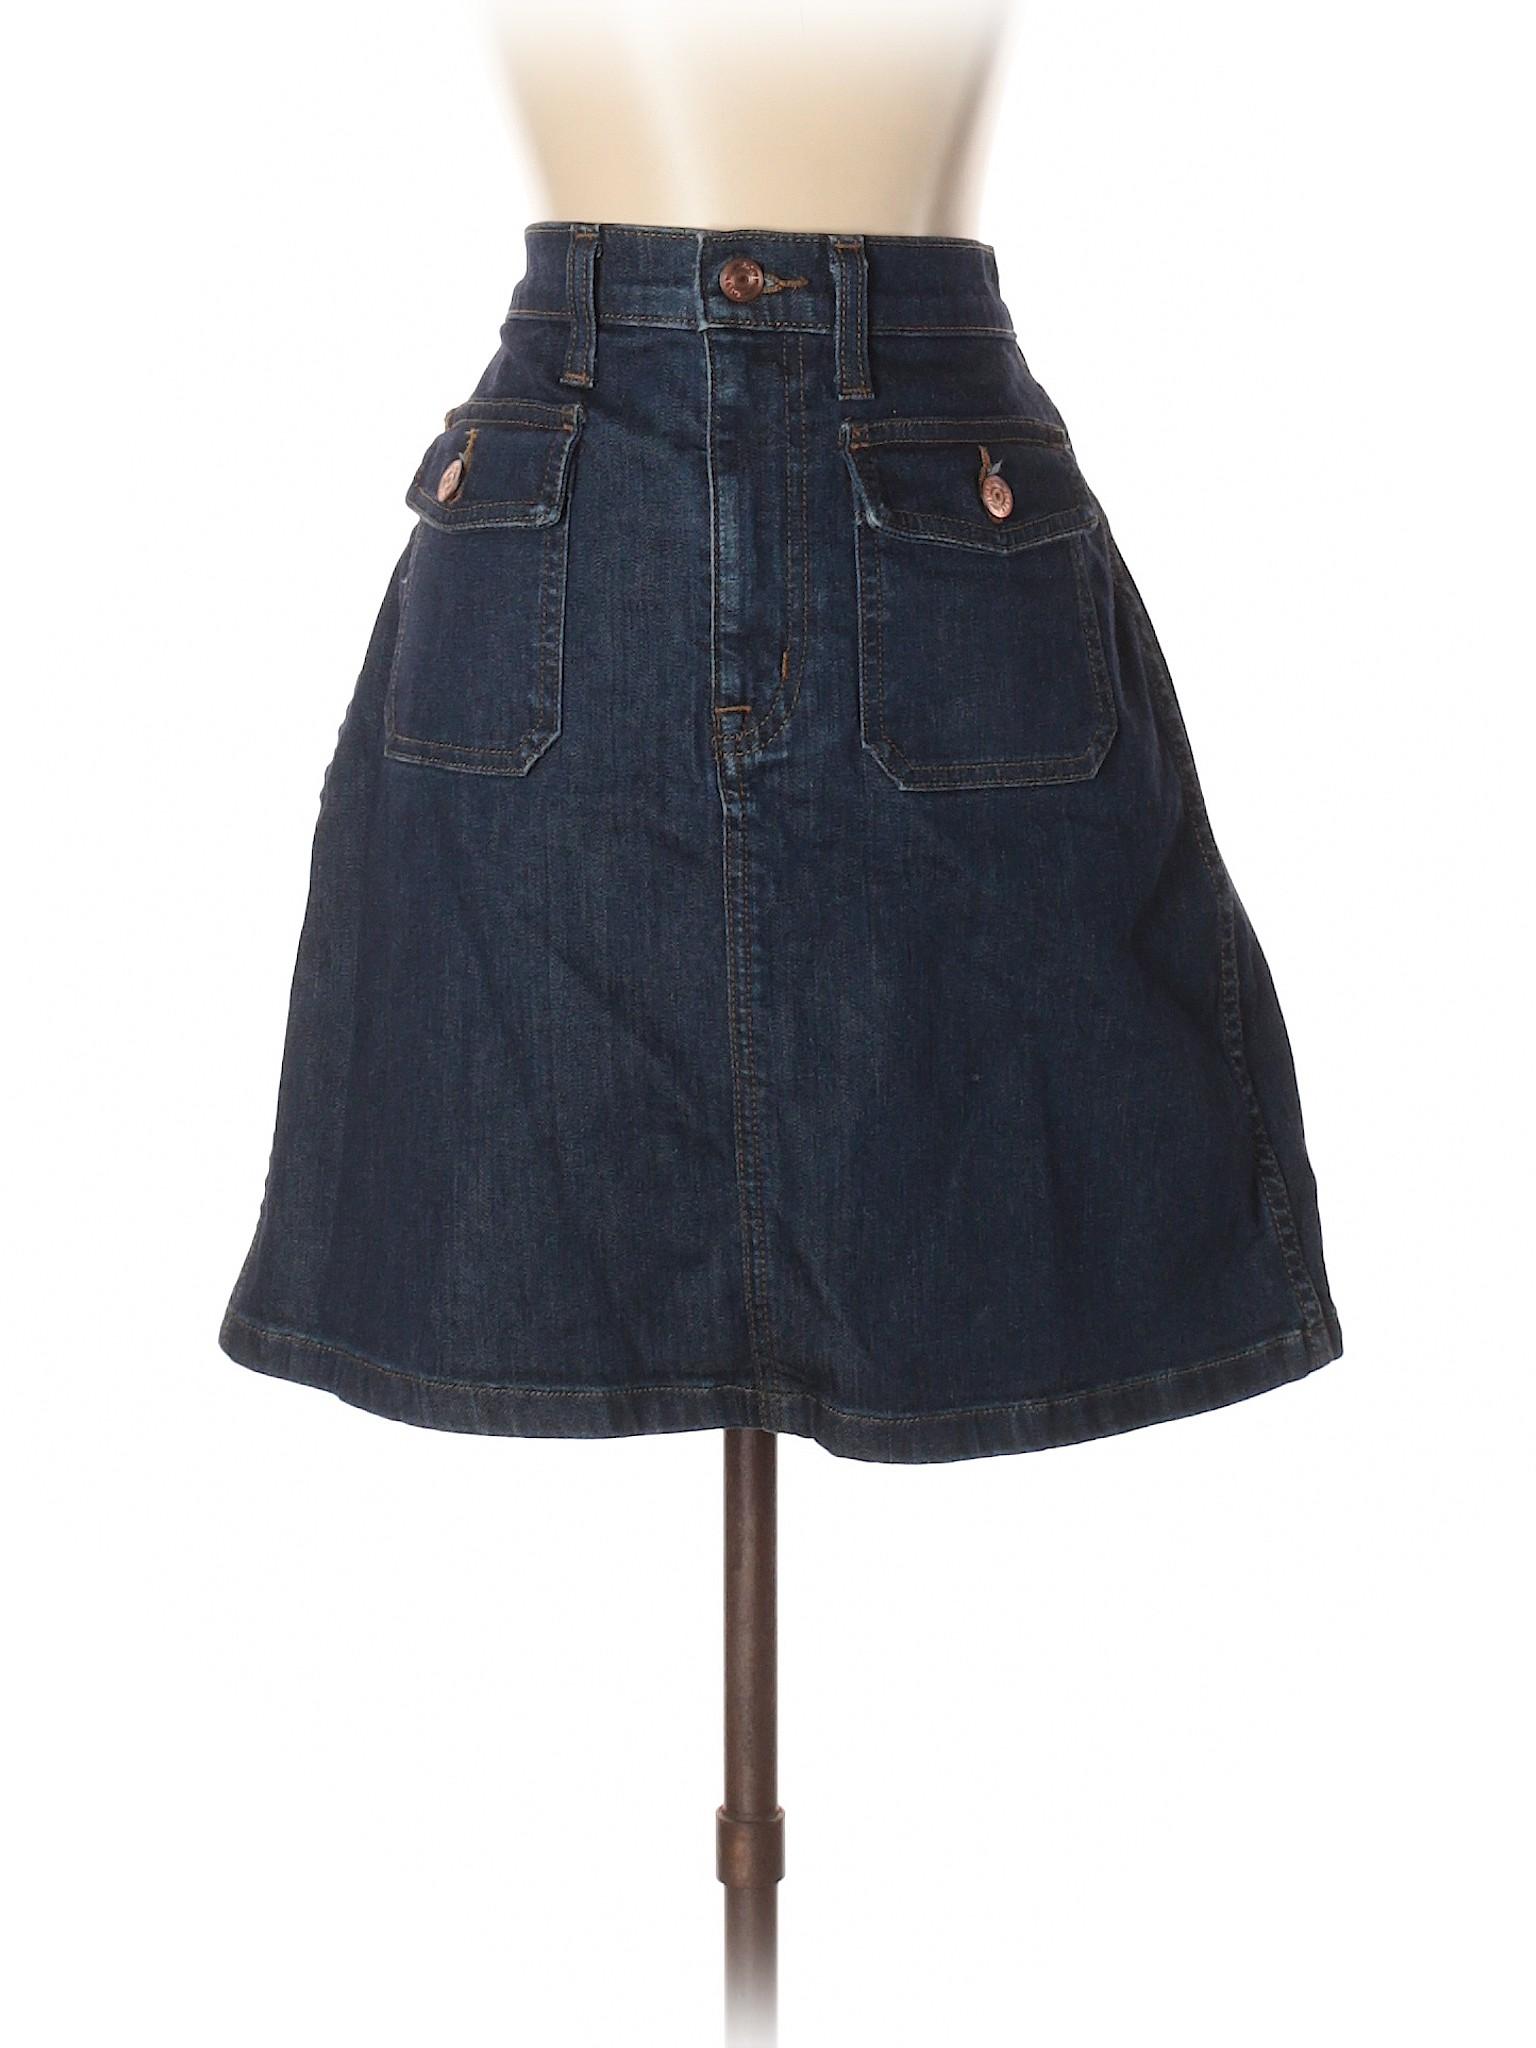 Denim Skirt Boutique Boutique Skirt Denim Boutique Boutique Denim Denim Skirt YSHwWT